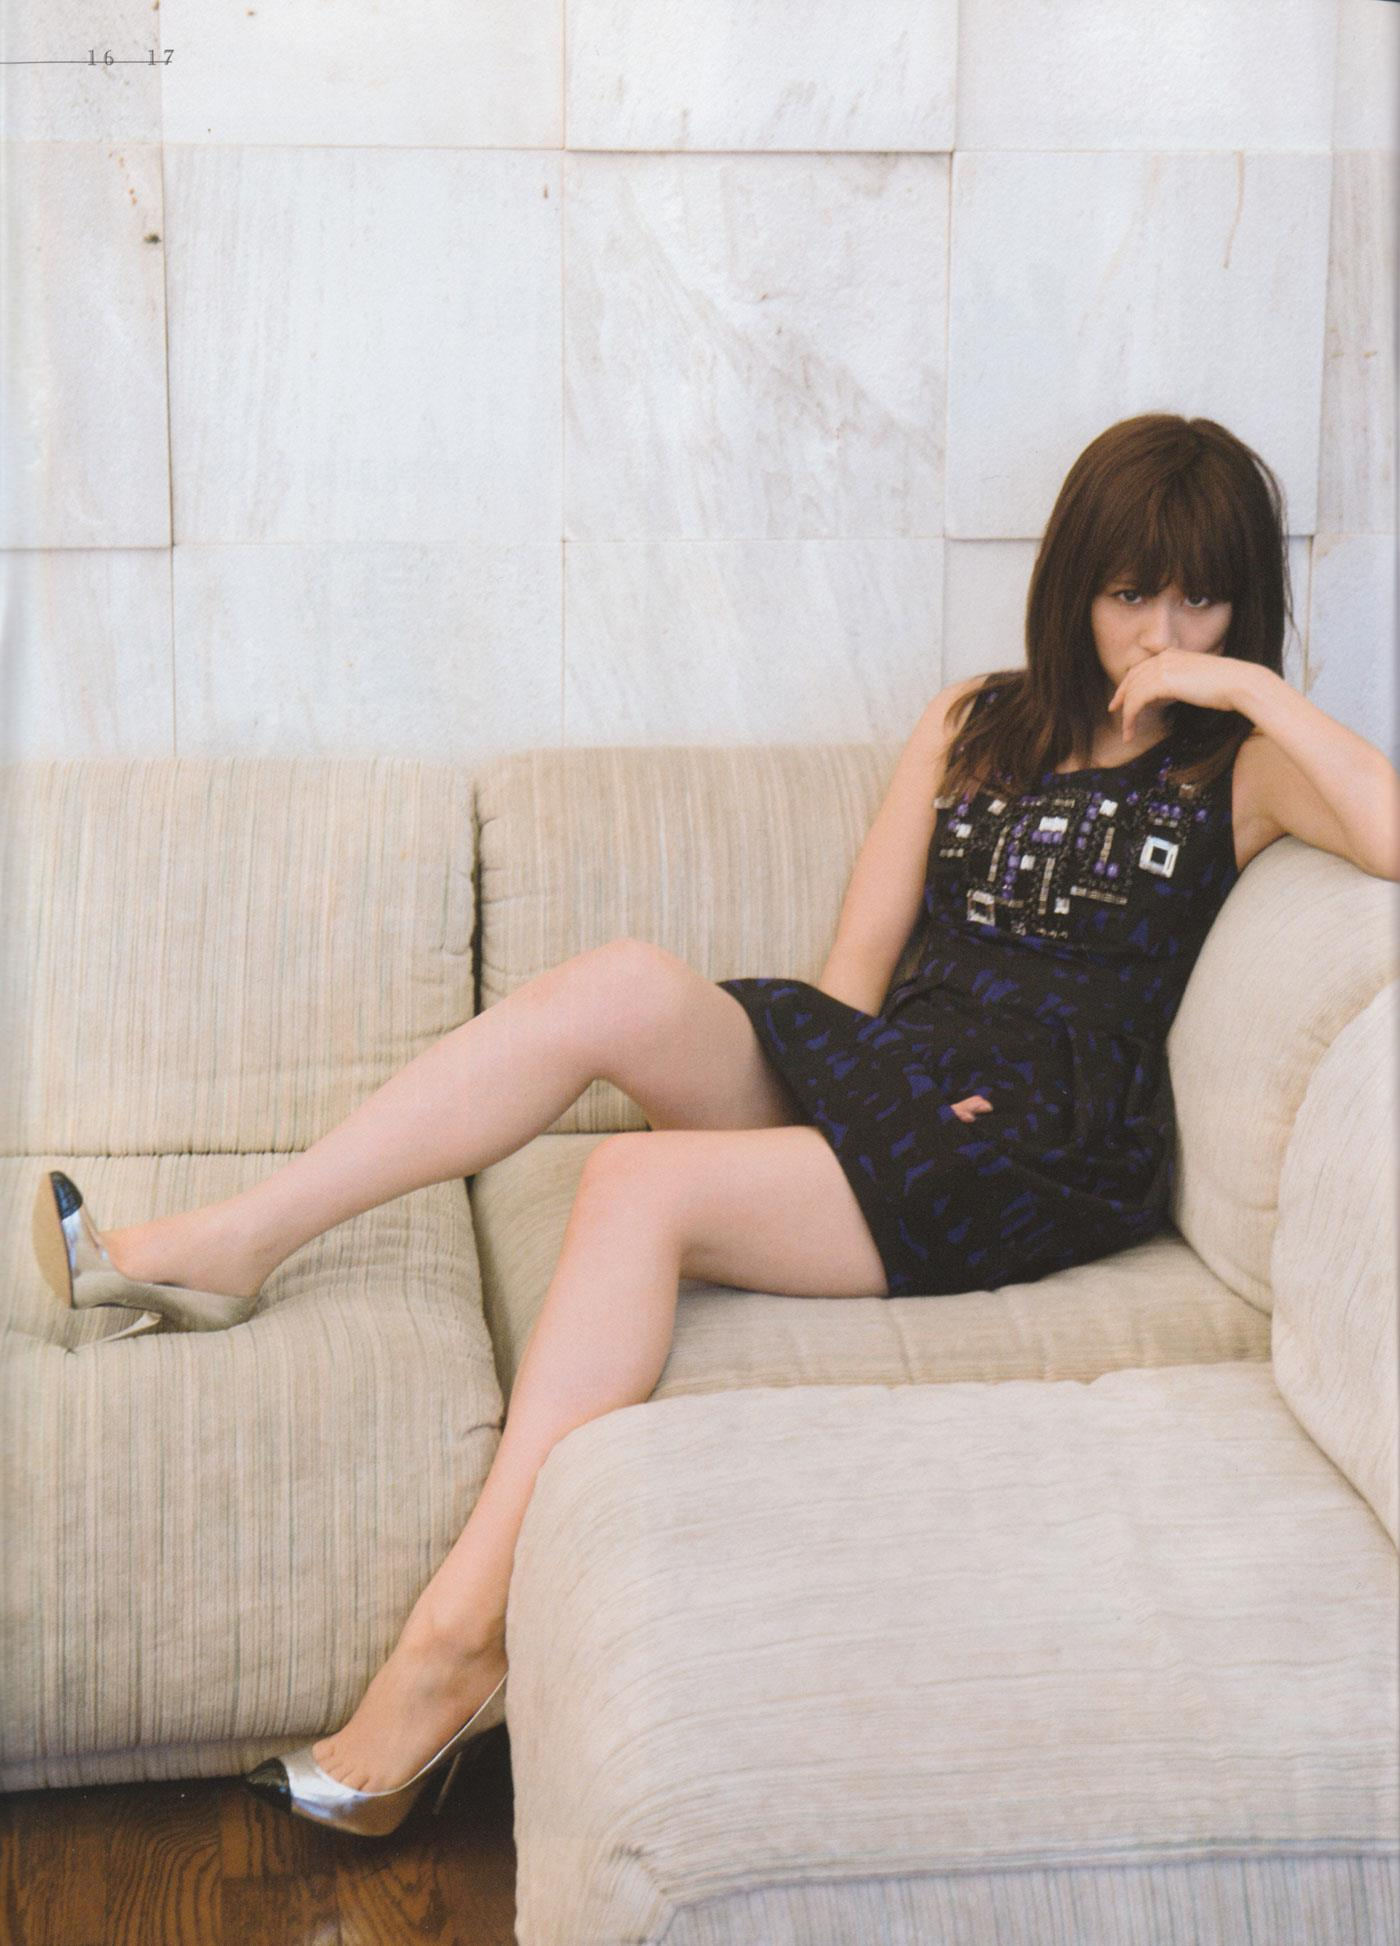 前田敦子 エロ画像 143